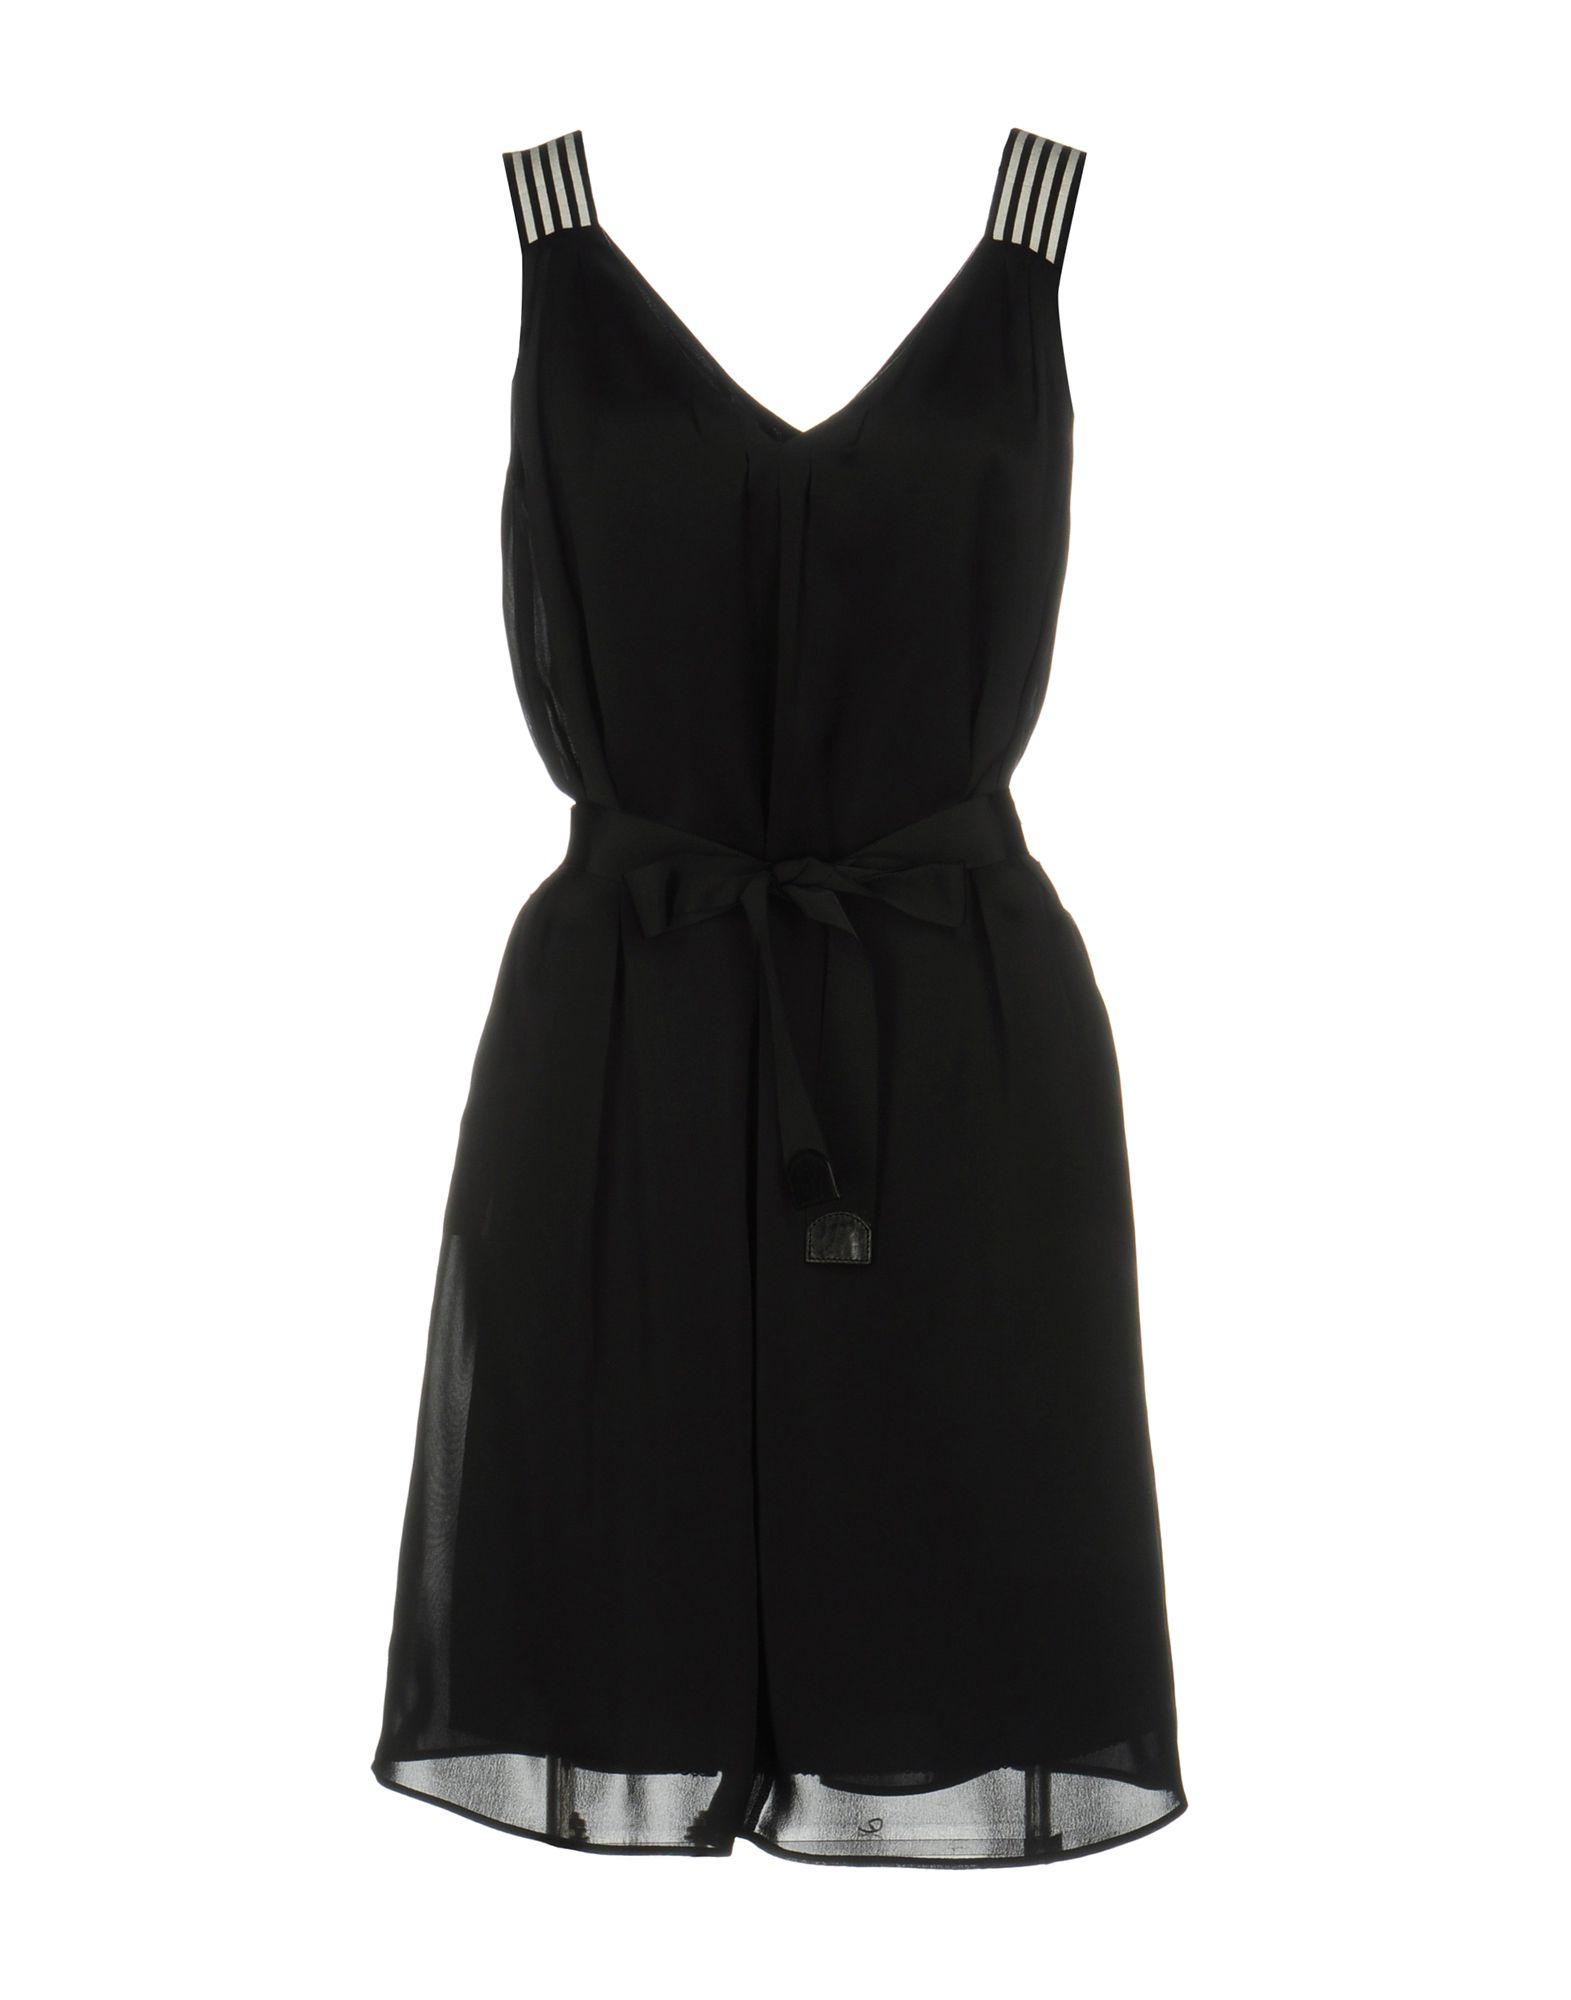 MARC CAIN Короткое платье легкий сарафан на бретелях marc cain платья и сарафаны мини короткие